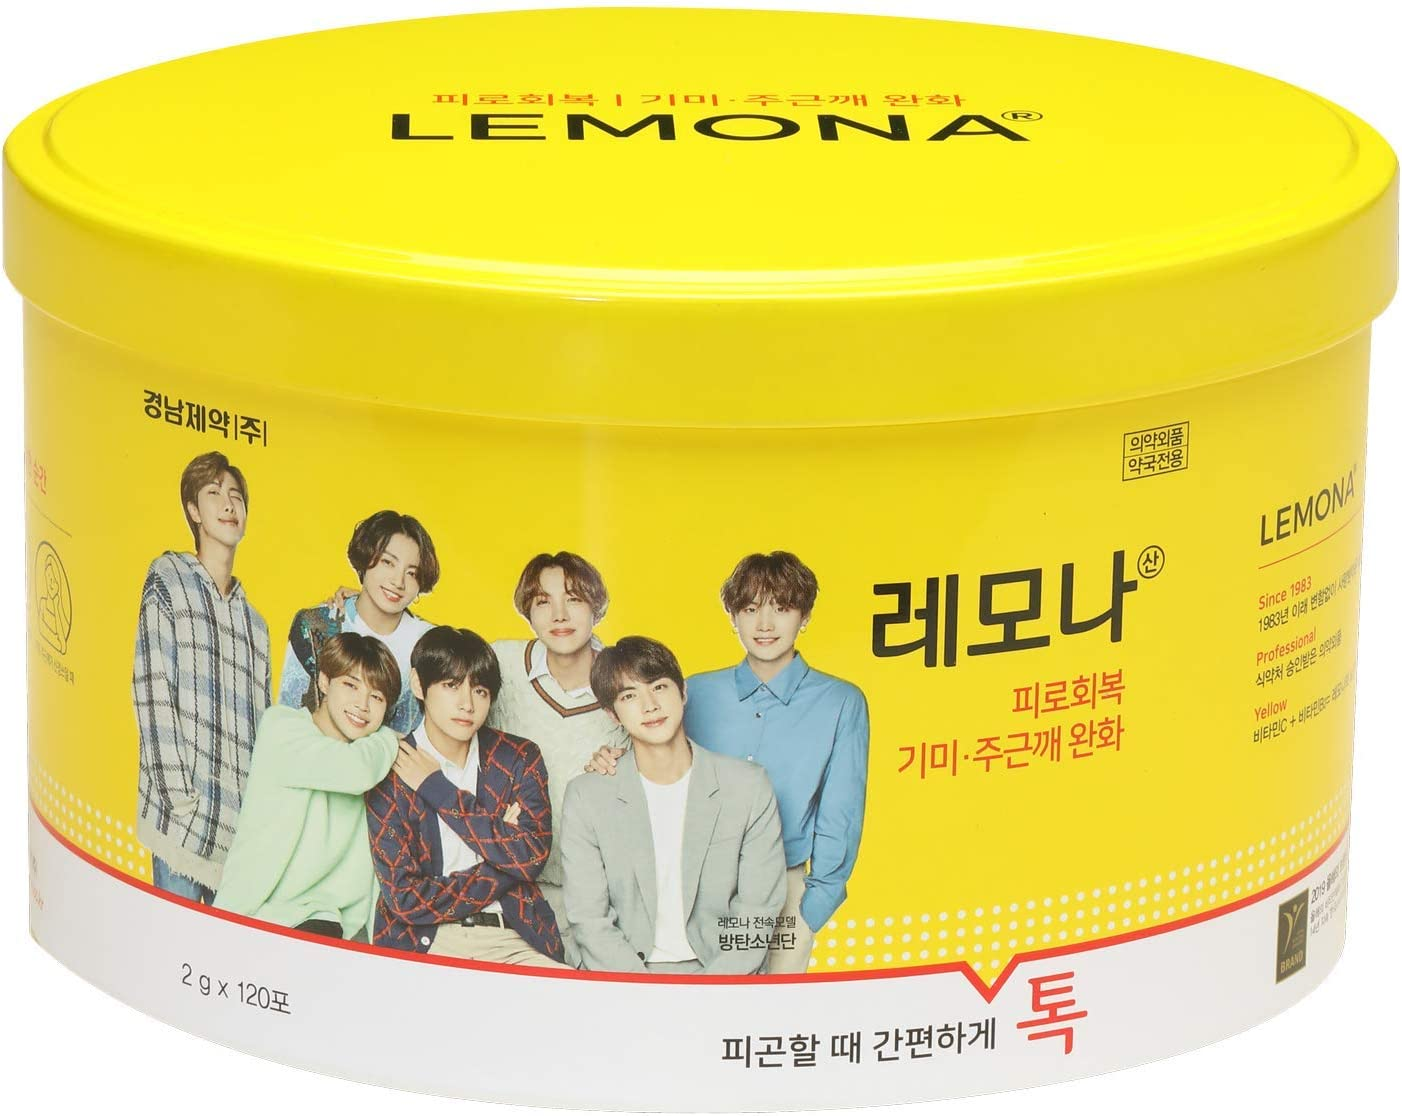 BTS Bangtan Boys Merchandise Vitamin - LEMONA Vitamin C, B2 and B6 Yellow Powder 2g x 120p Official BTS Photo Printed Merch